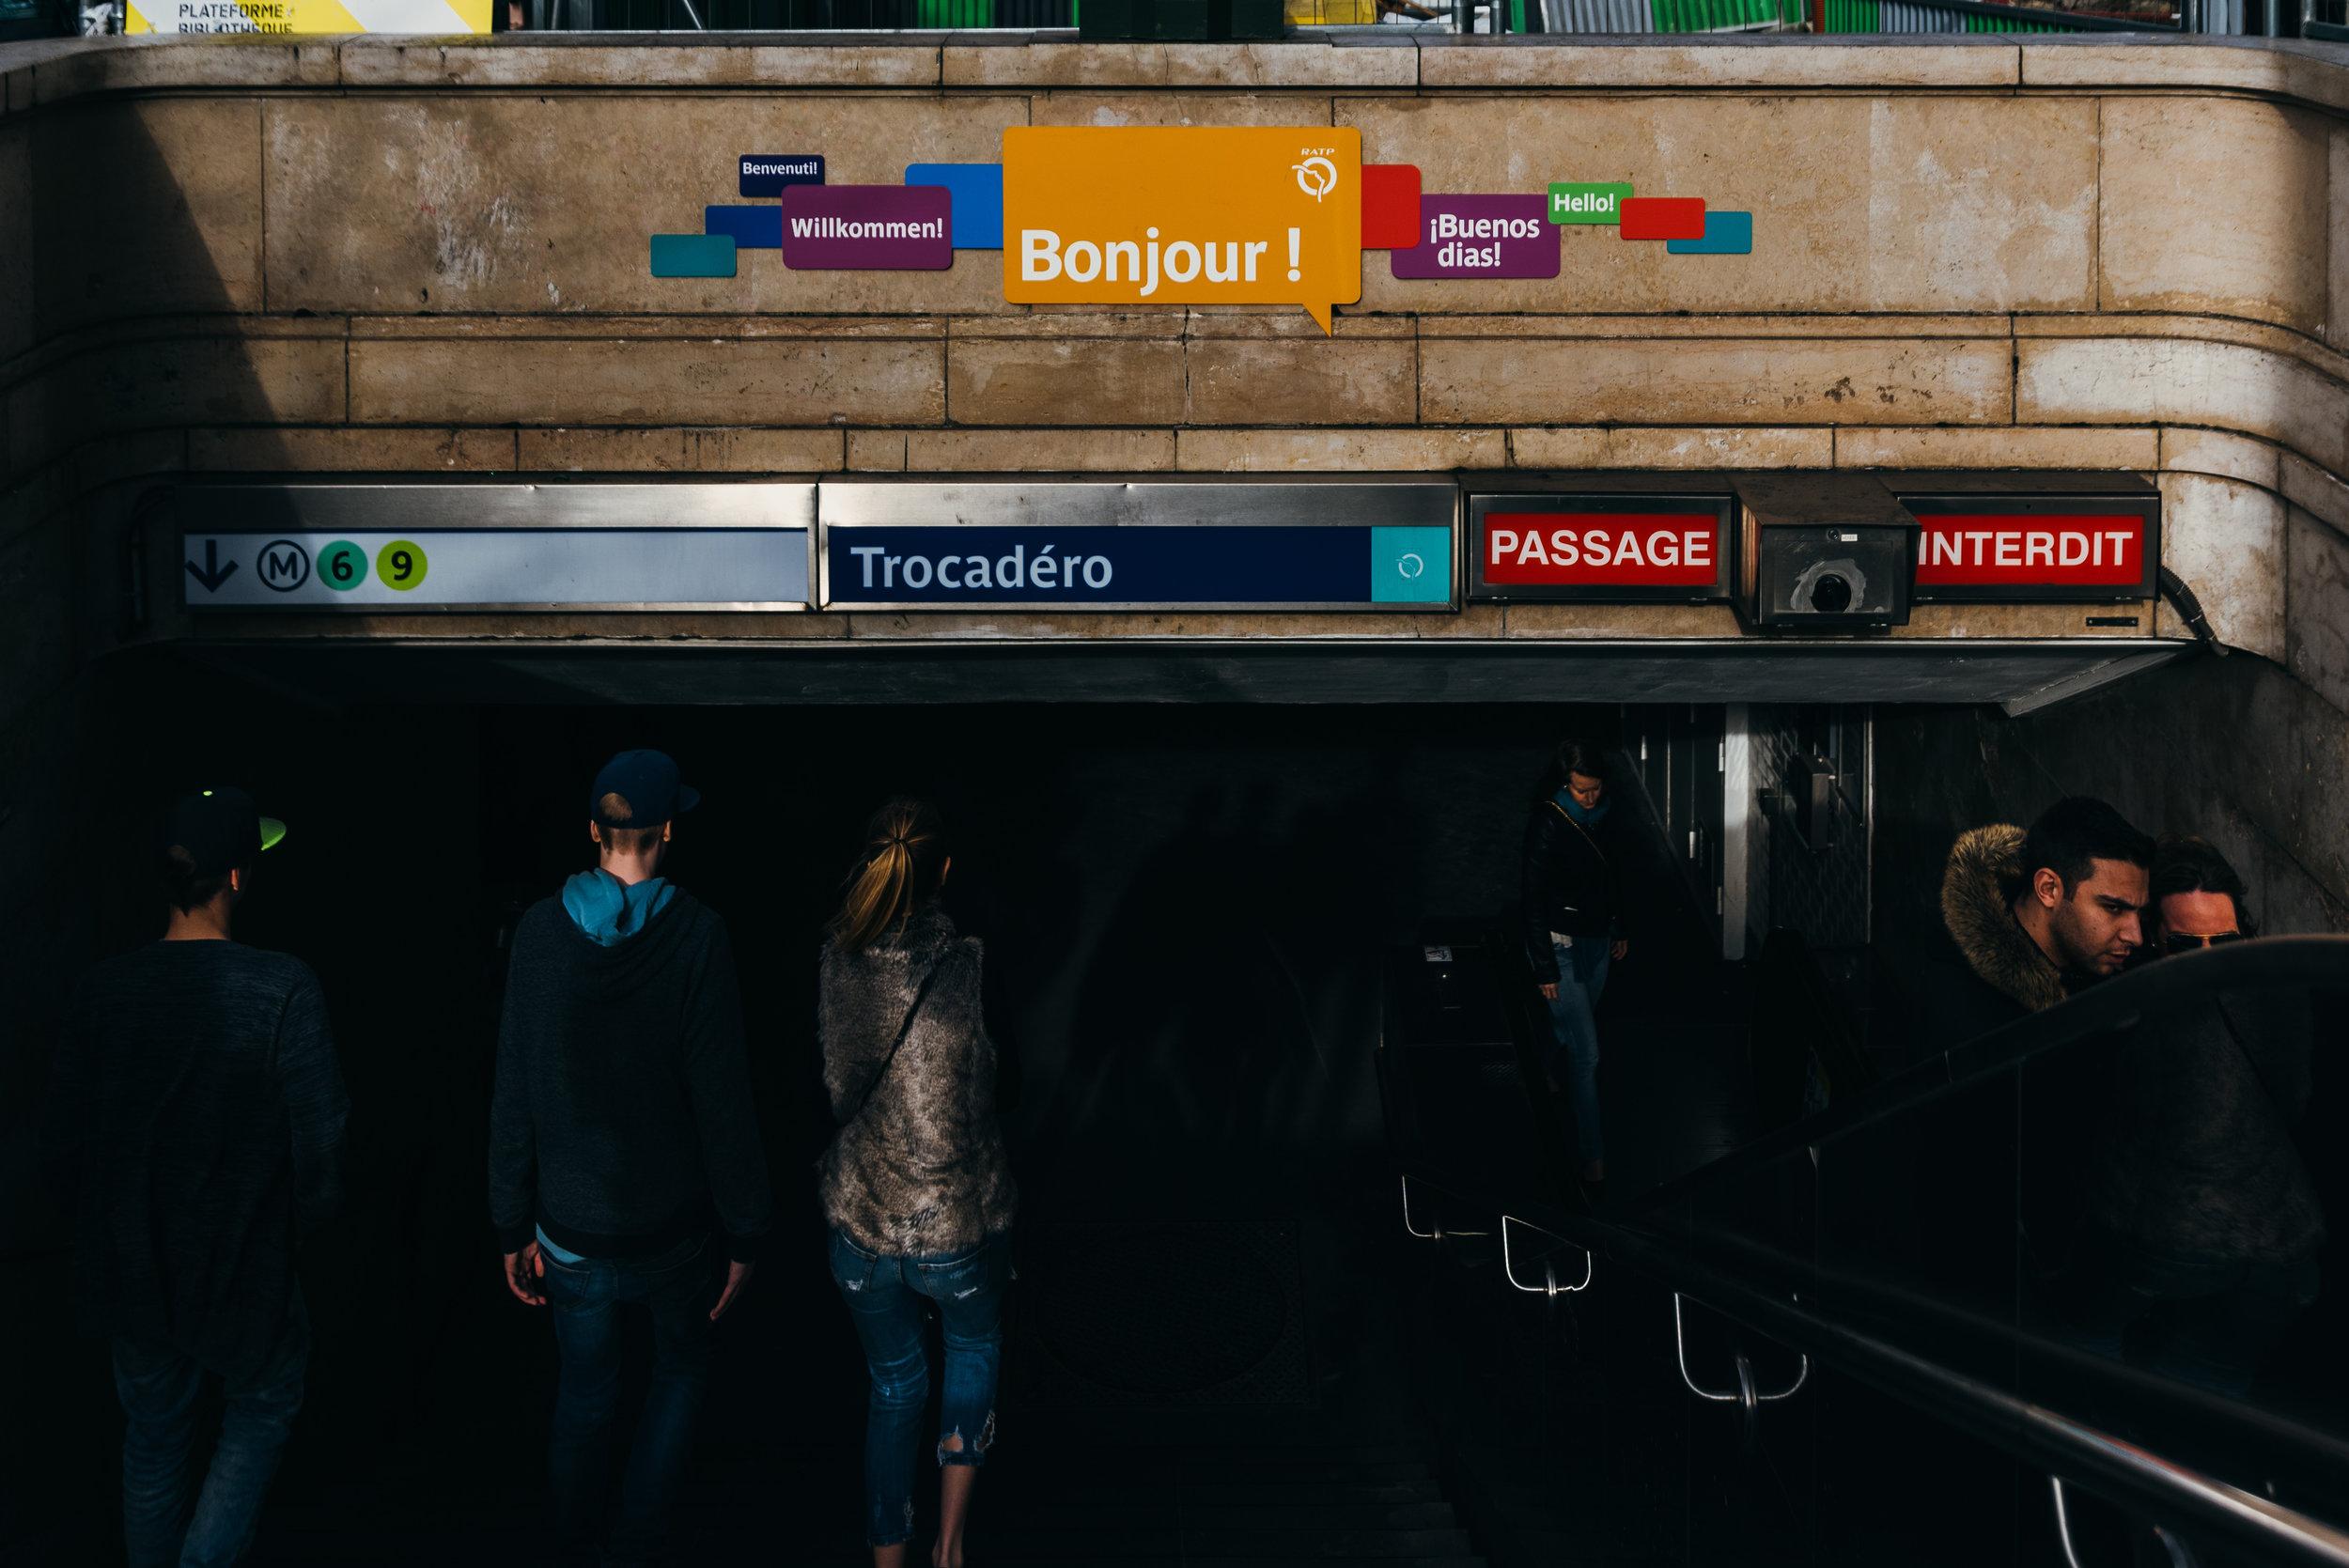 Trocadero.jpg